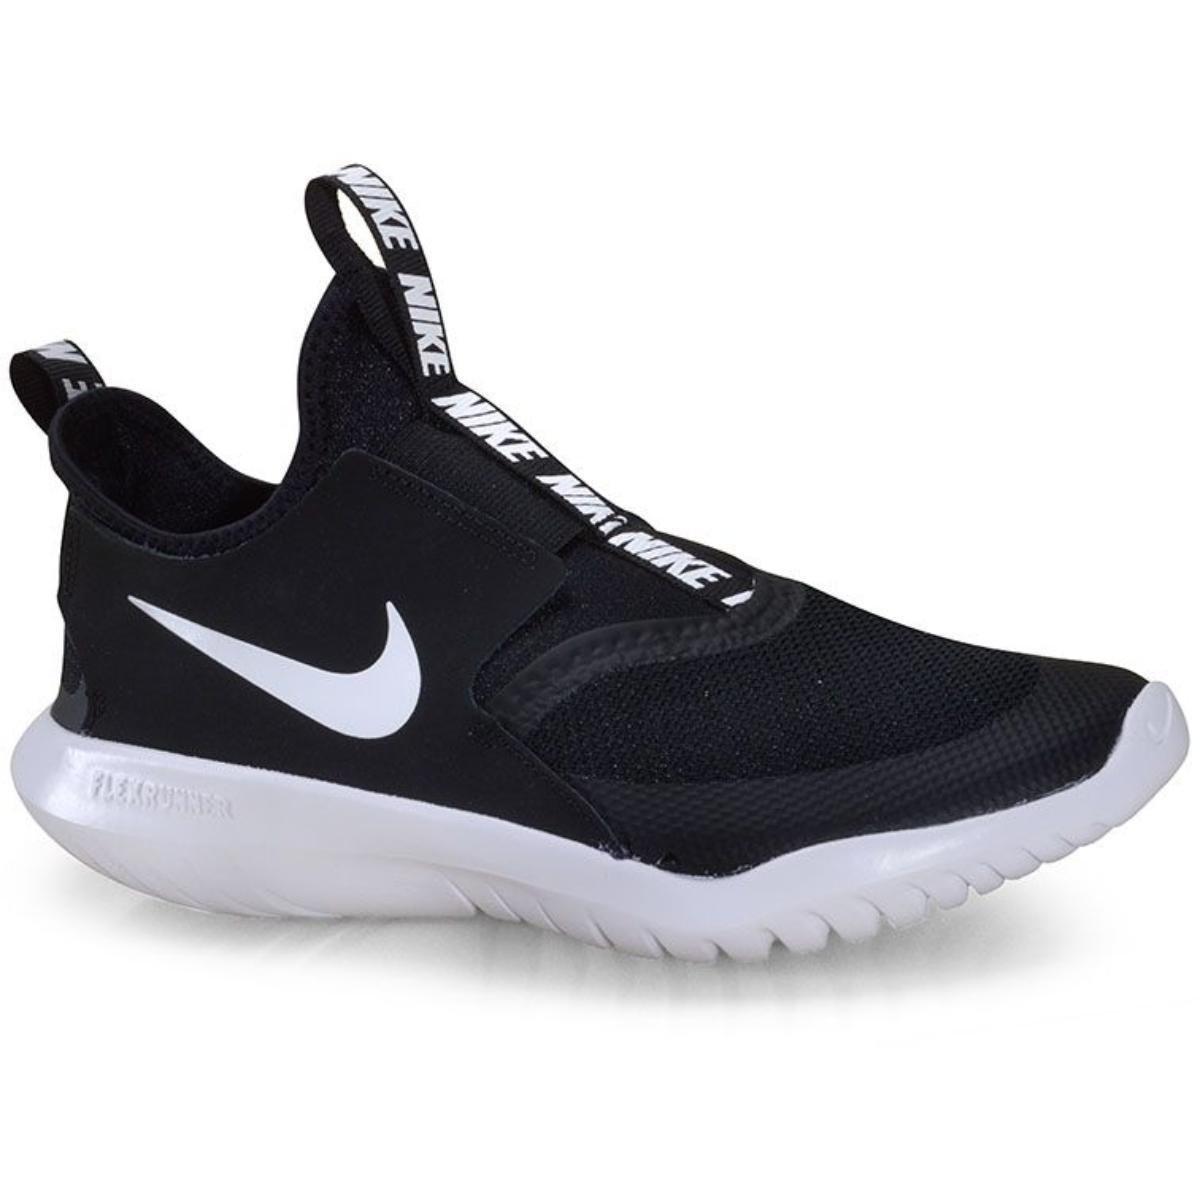 Tênis Feminino Nike At4662-001 Flex Runner Preto/branco